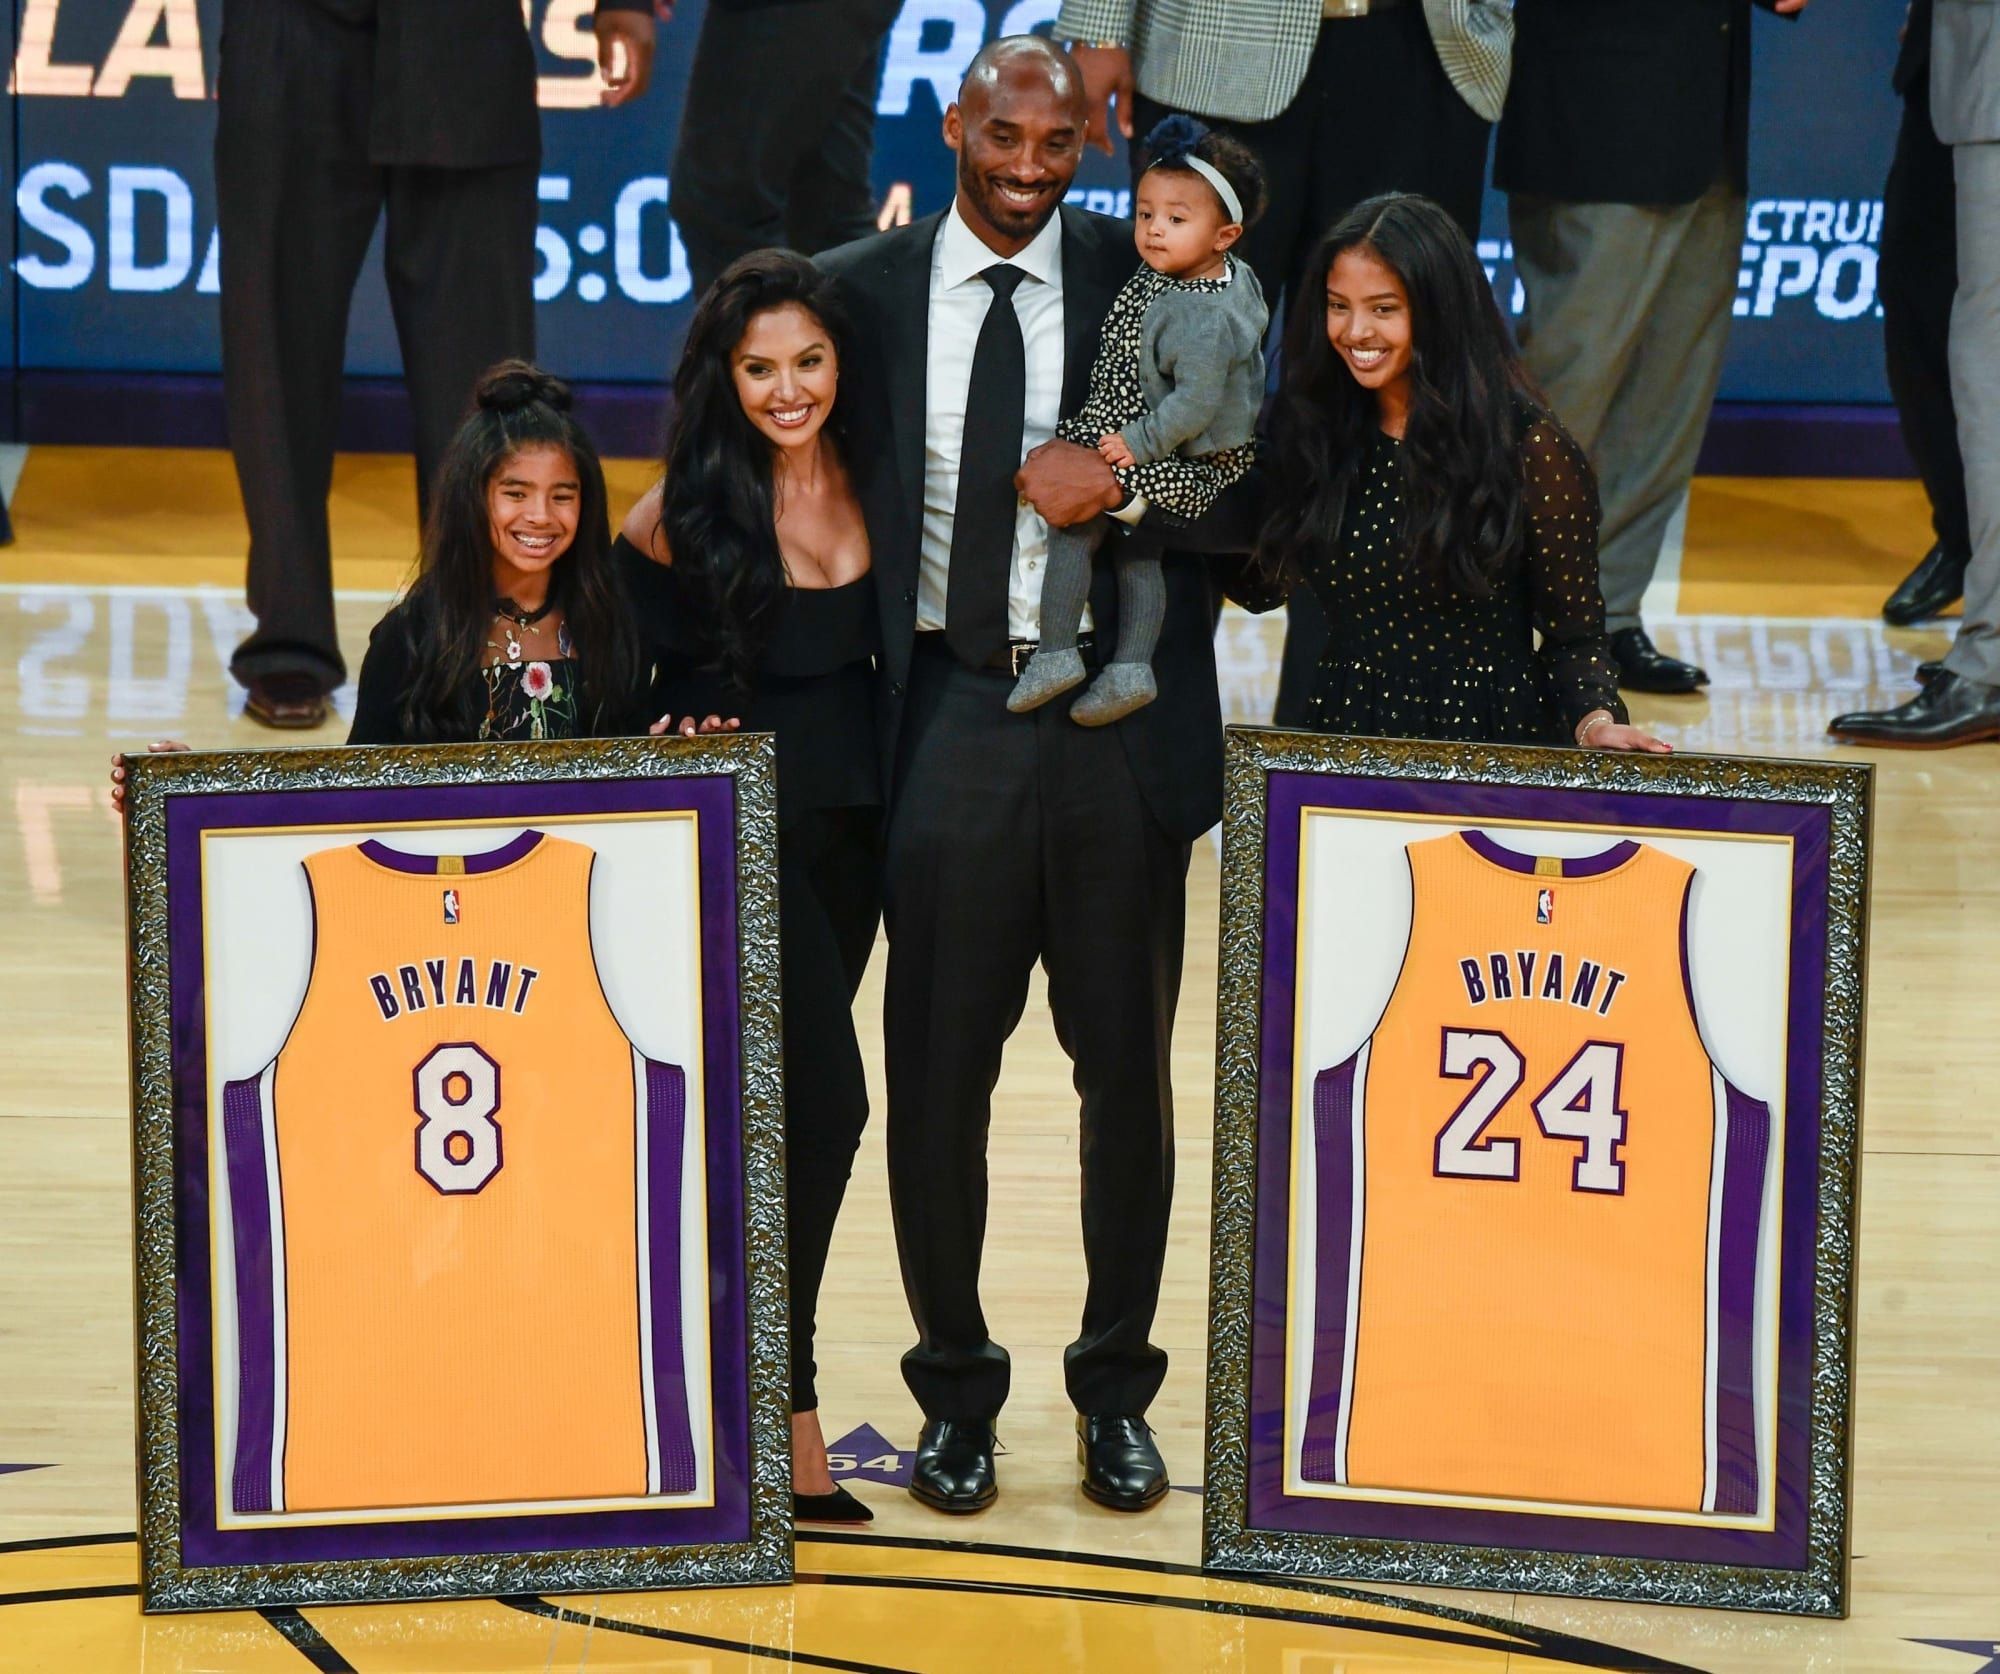 Kobe Bryant estate ends long-time partnership with Nike